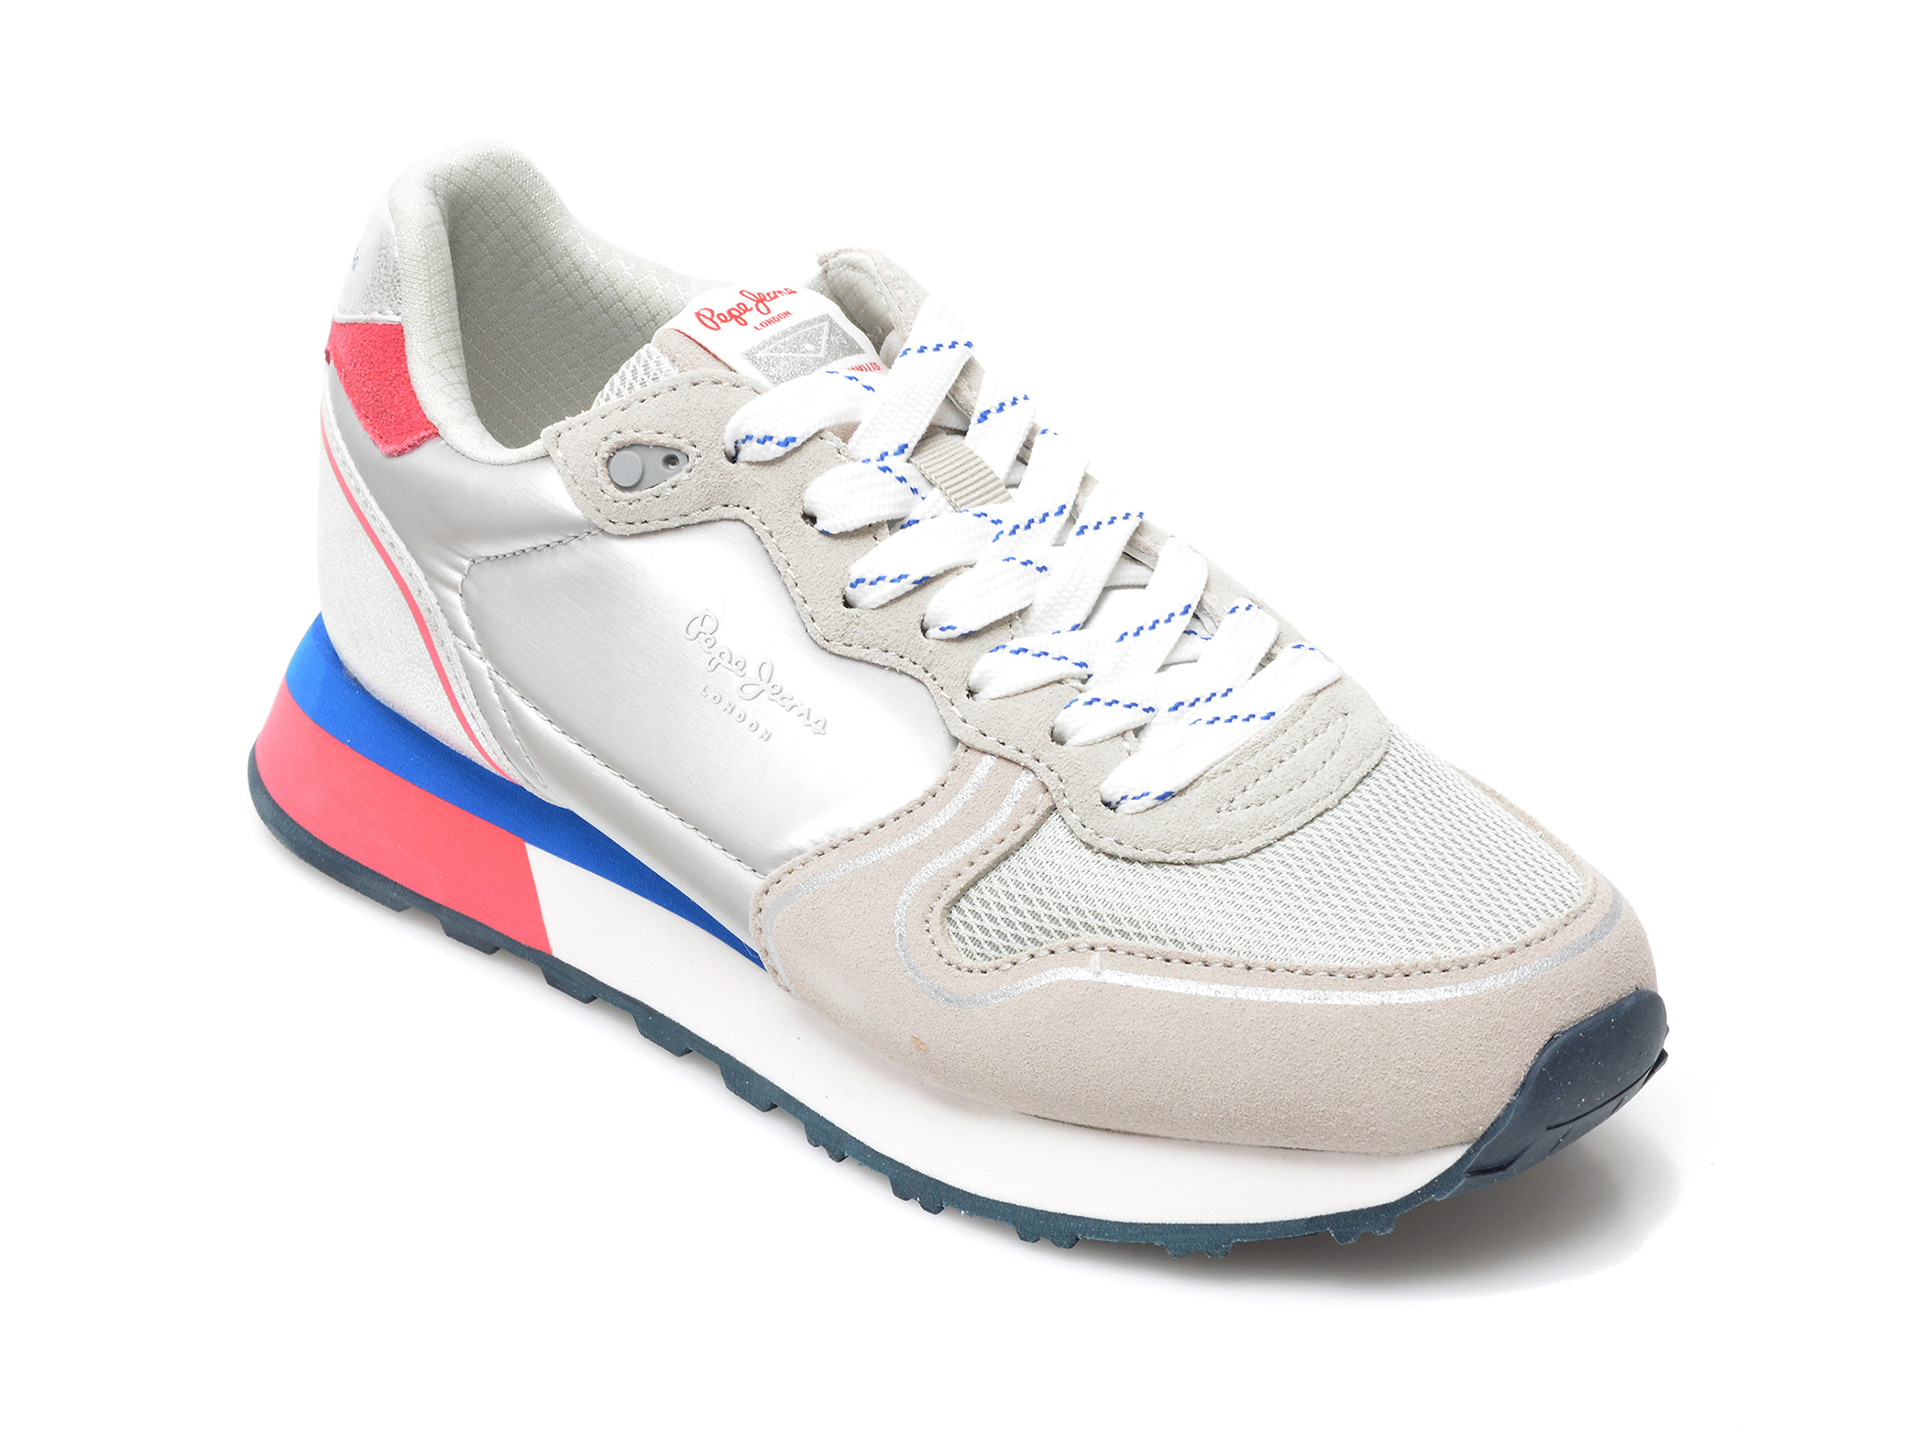 Pantofi sport PEPE JEANS argintii, 3116399, din material textil si piele naturala